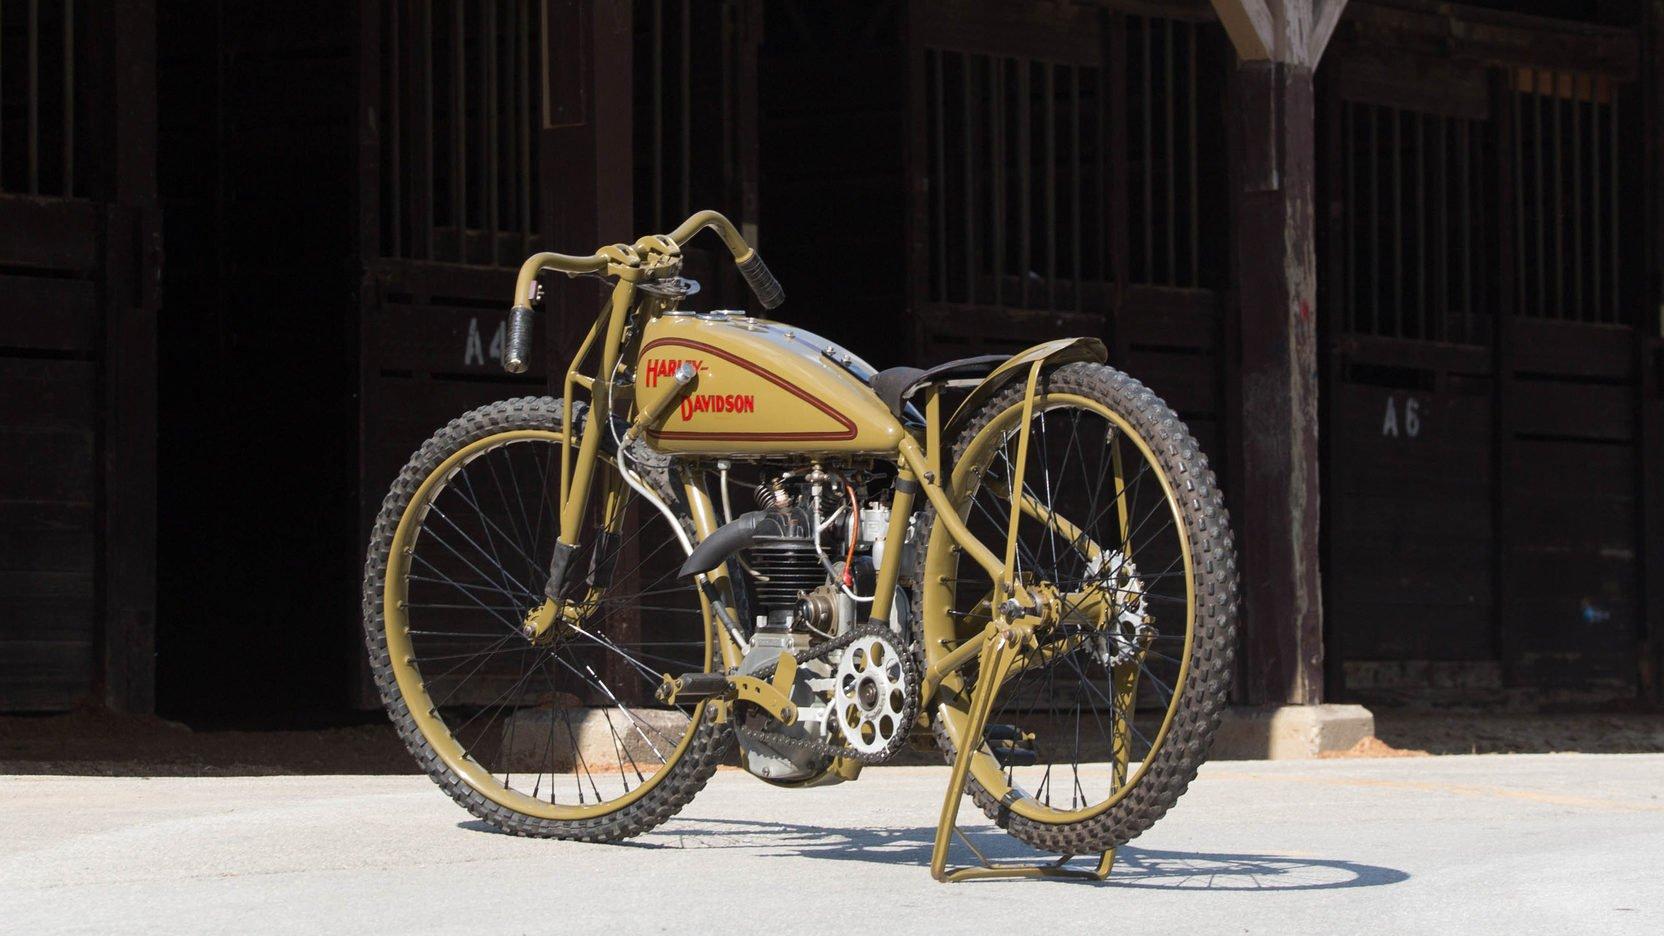 Harley Davidson: 1928 Harley-Davidson Peashooter